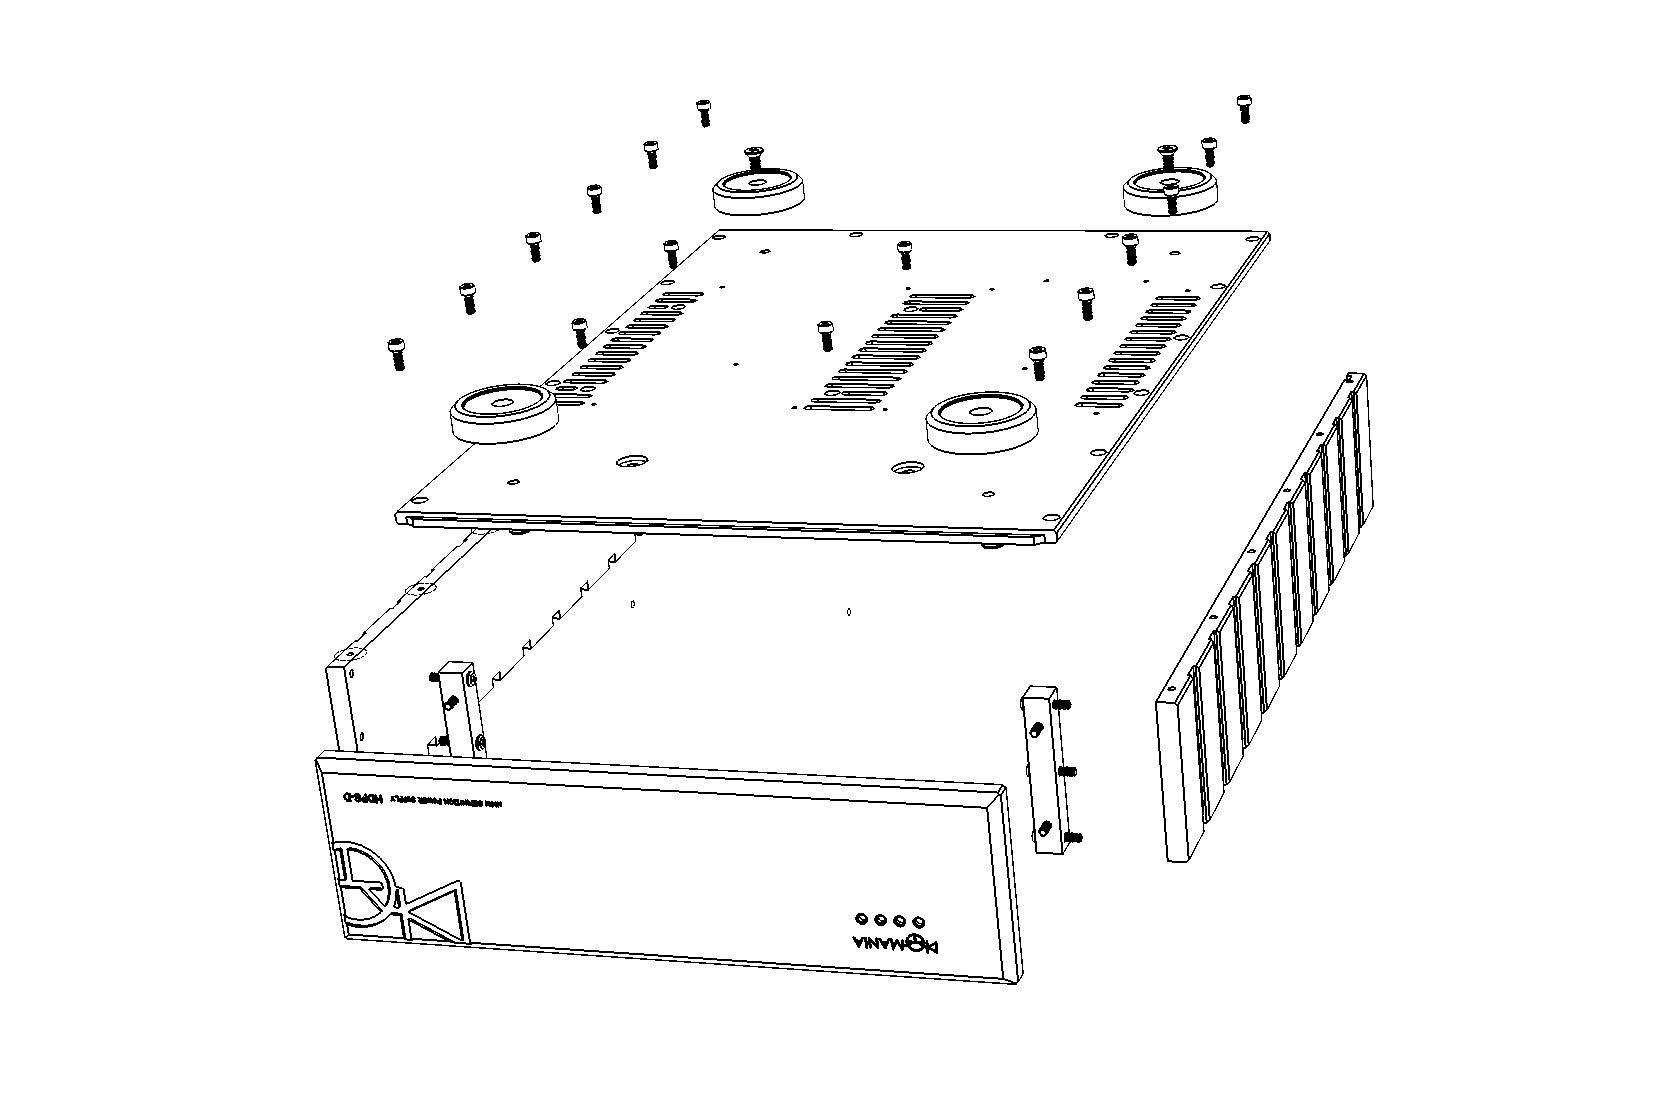 HDPS_assemble_2.jpg